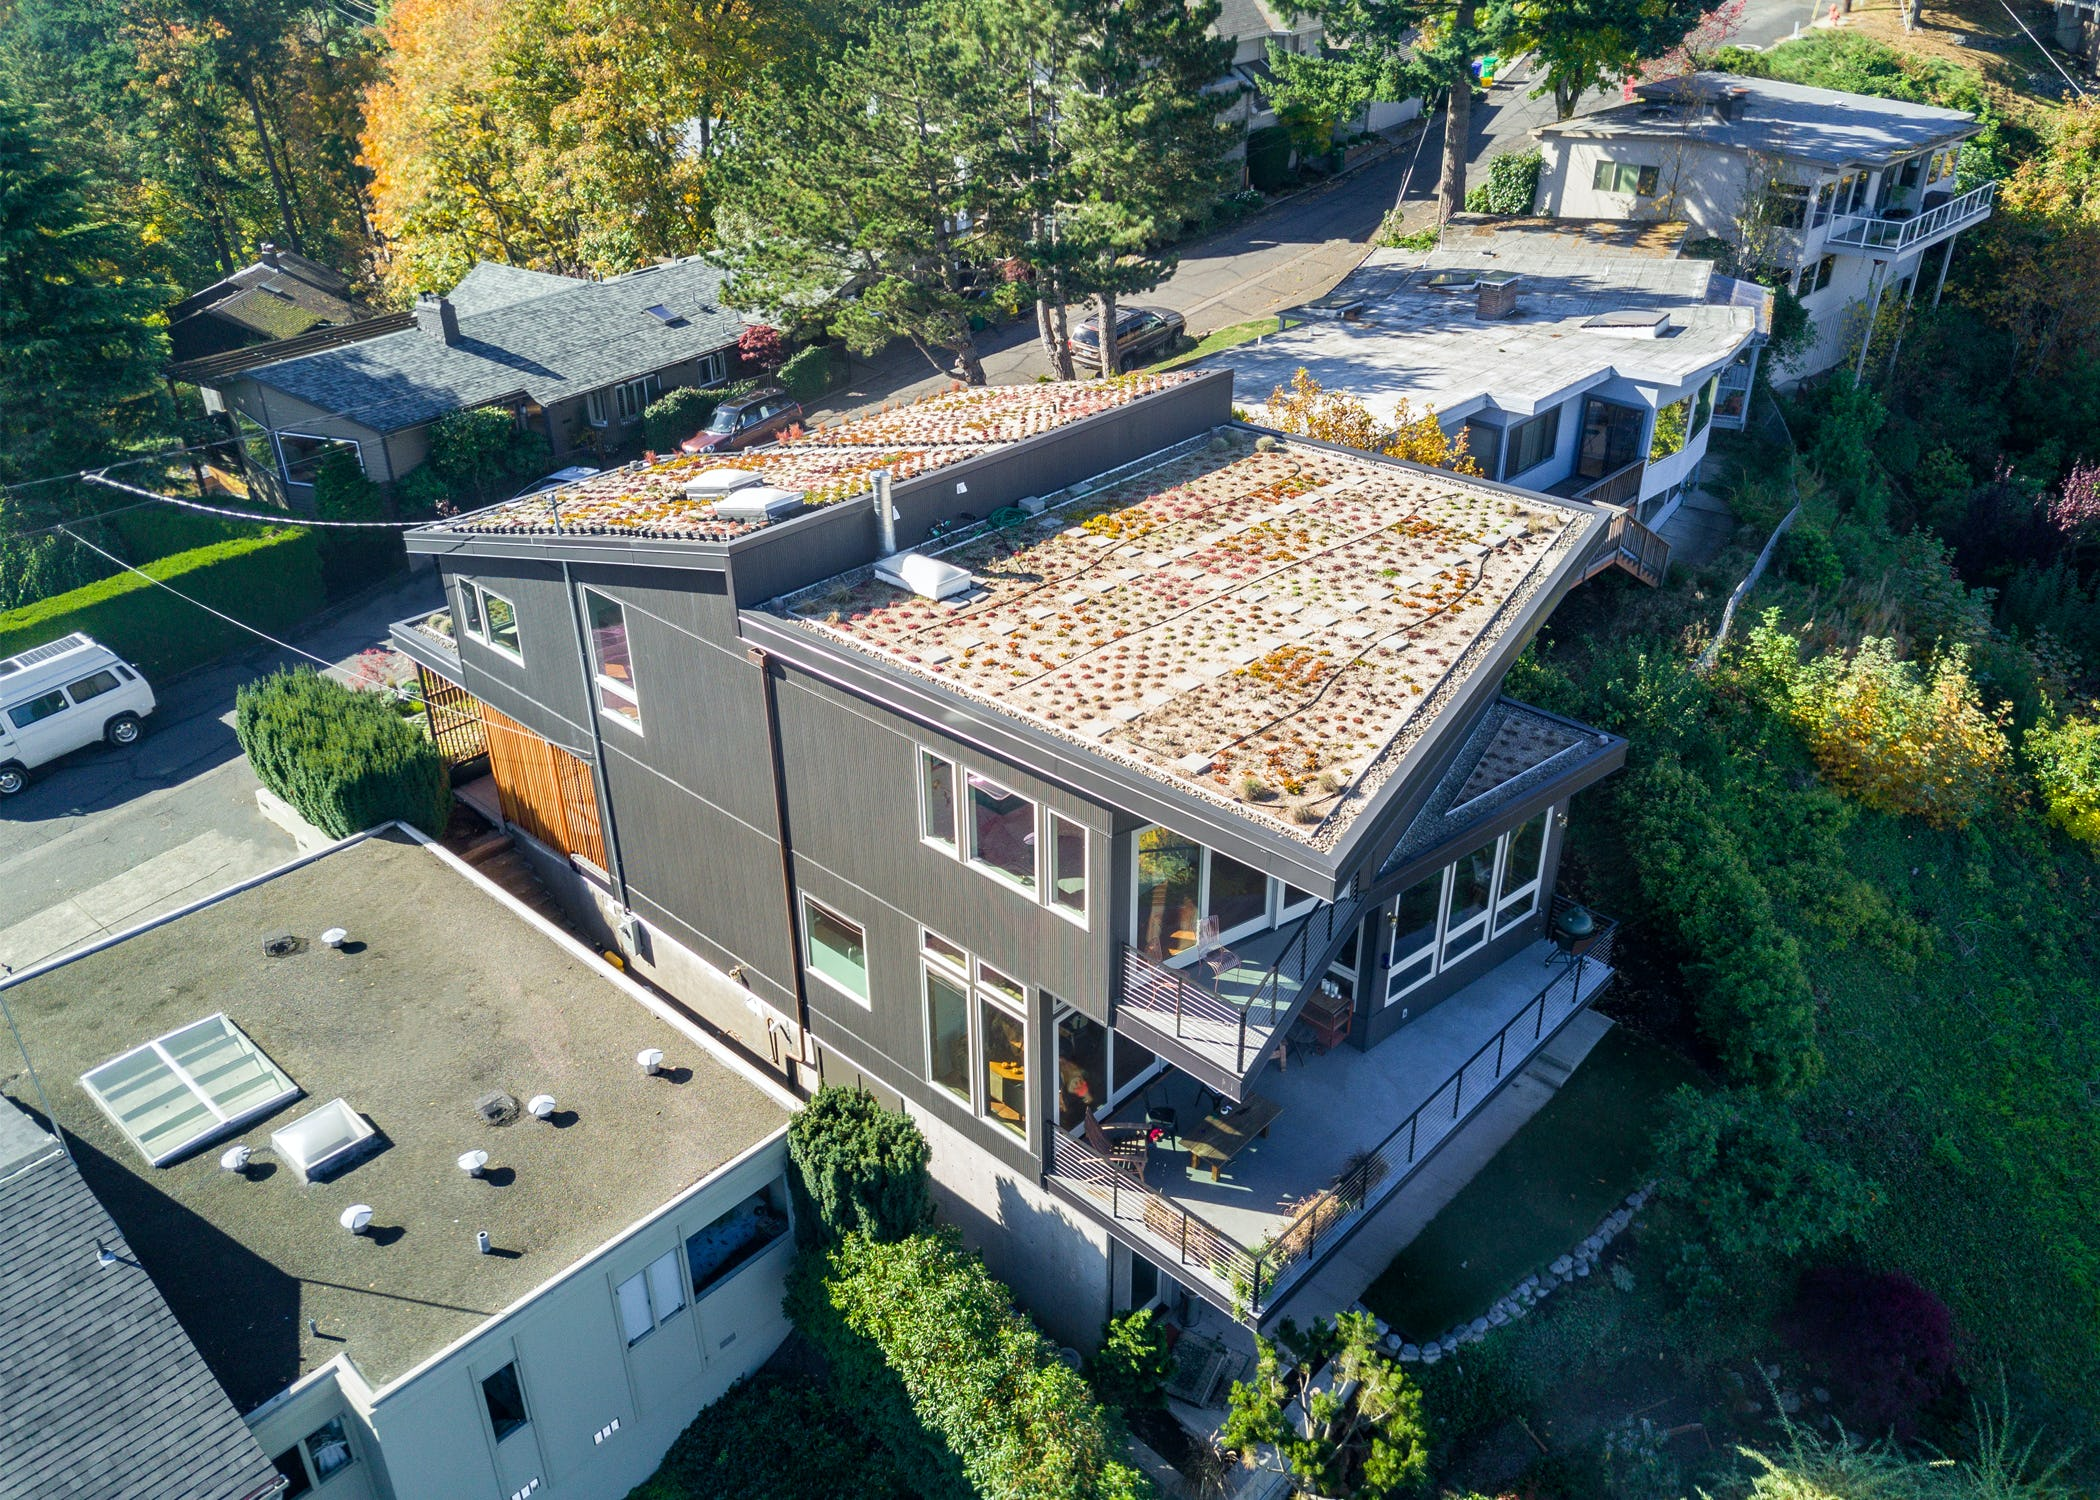 Siteworks montevista design build portland oregon residential interior design 01